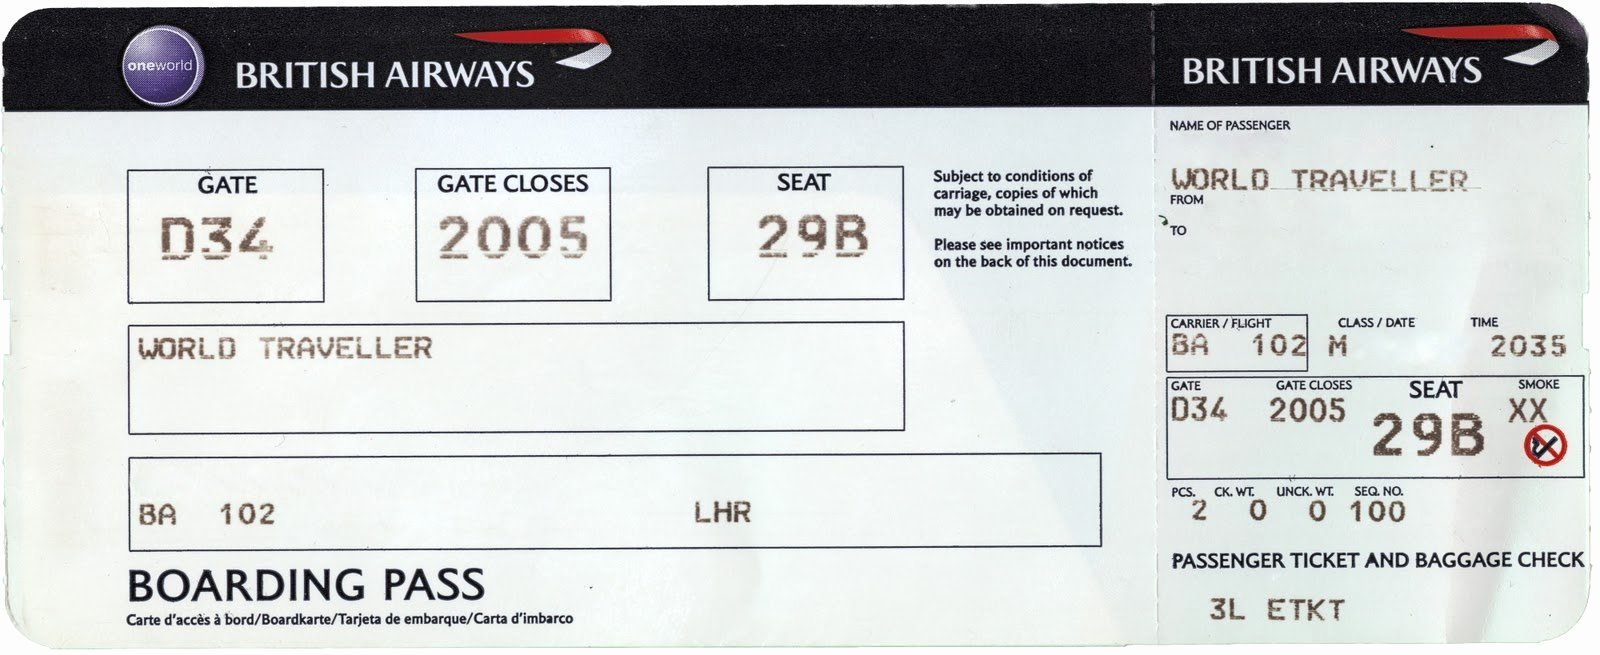 Airline Ticket Gift Certificate Template New Ucuz Uçak Bileti